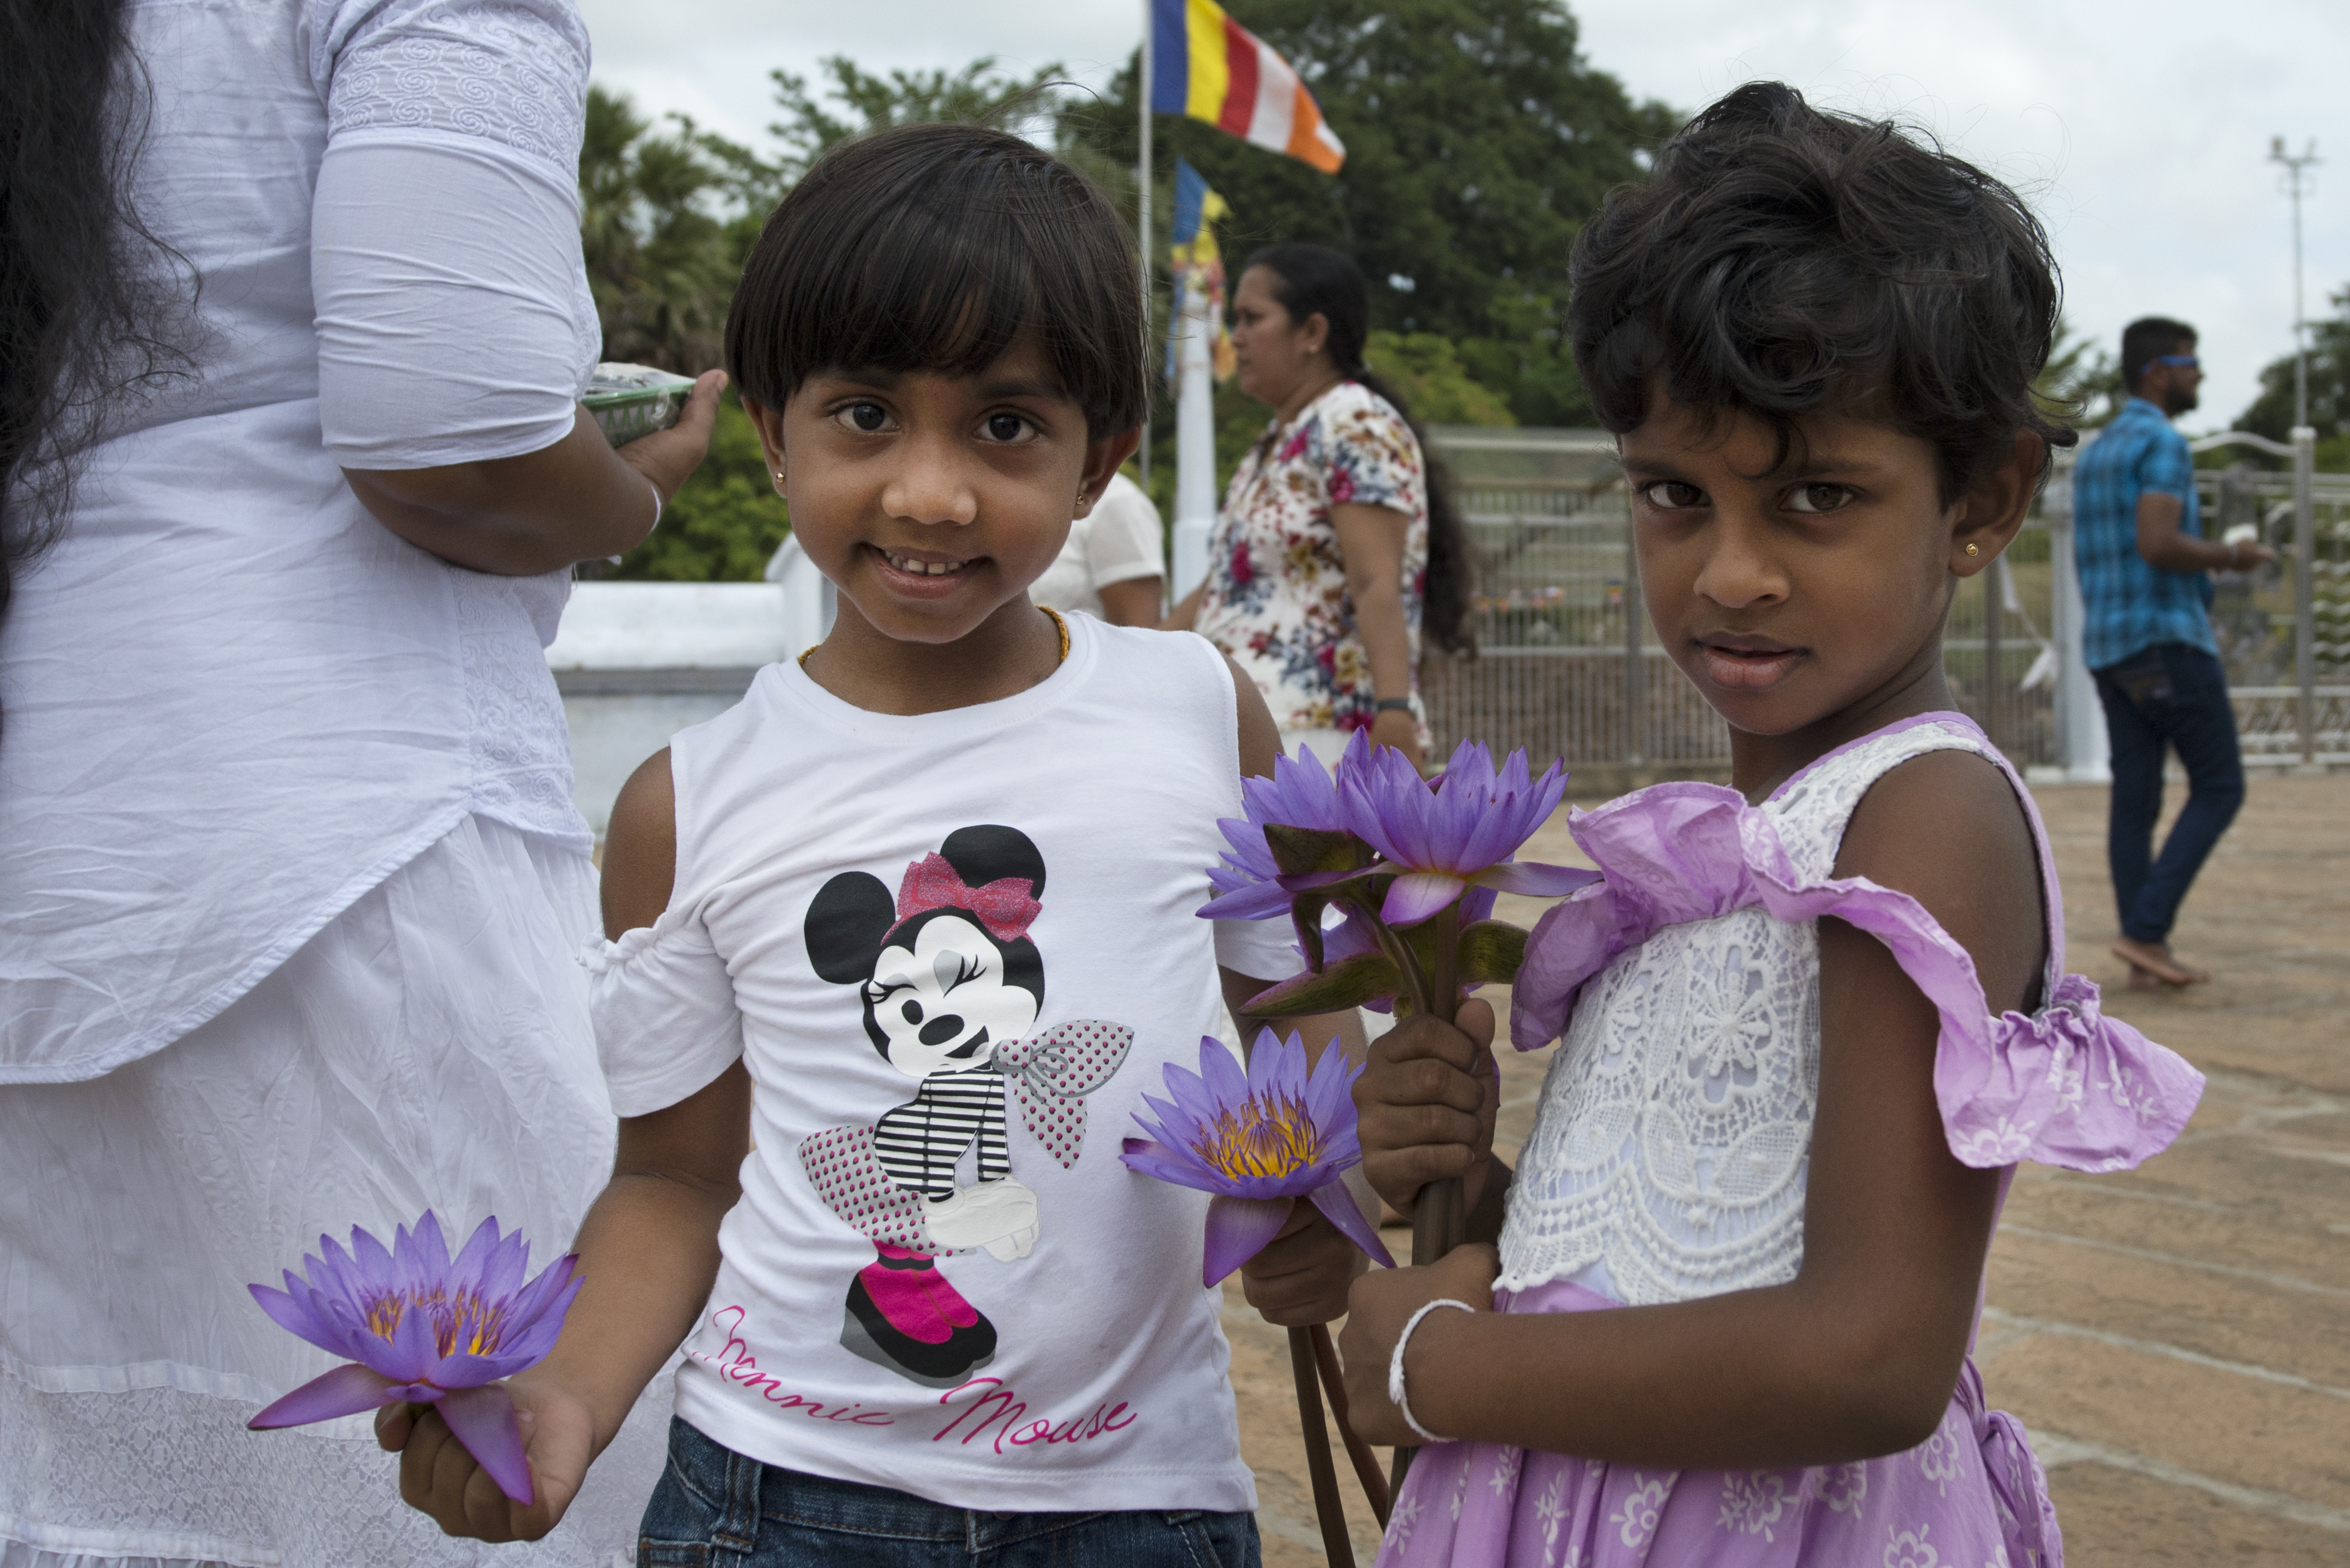 Anuradhapura_girls with waterlilies_closeup